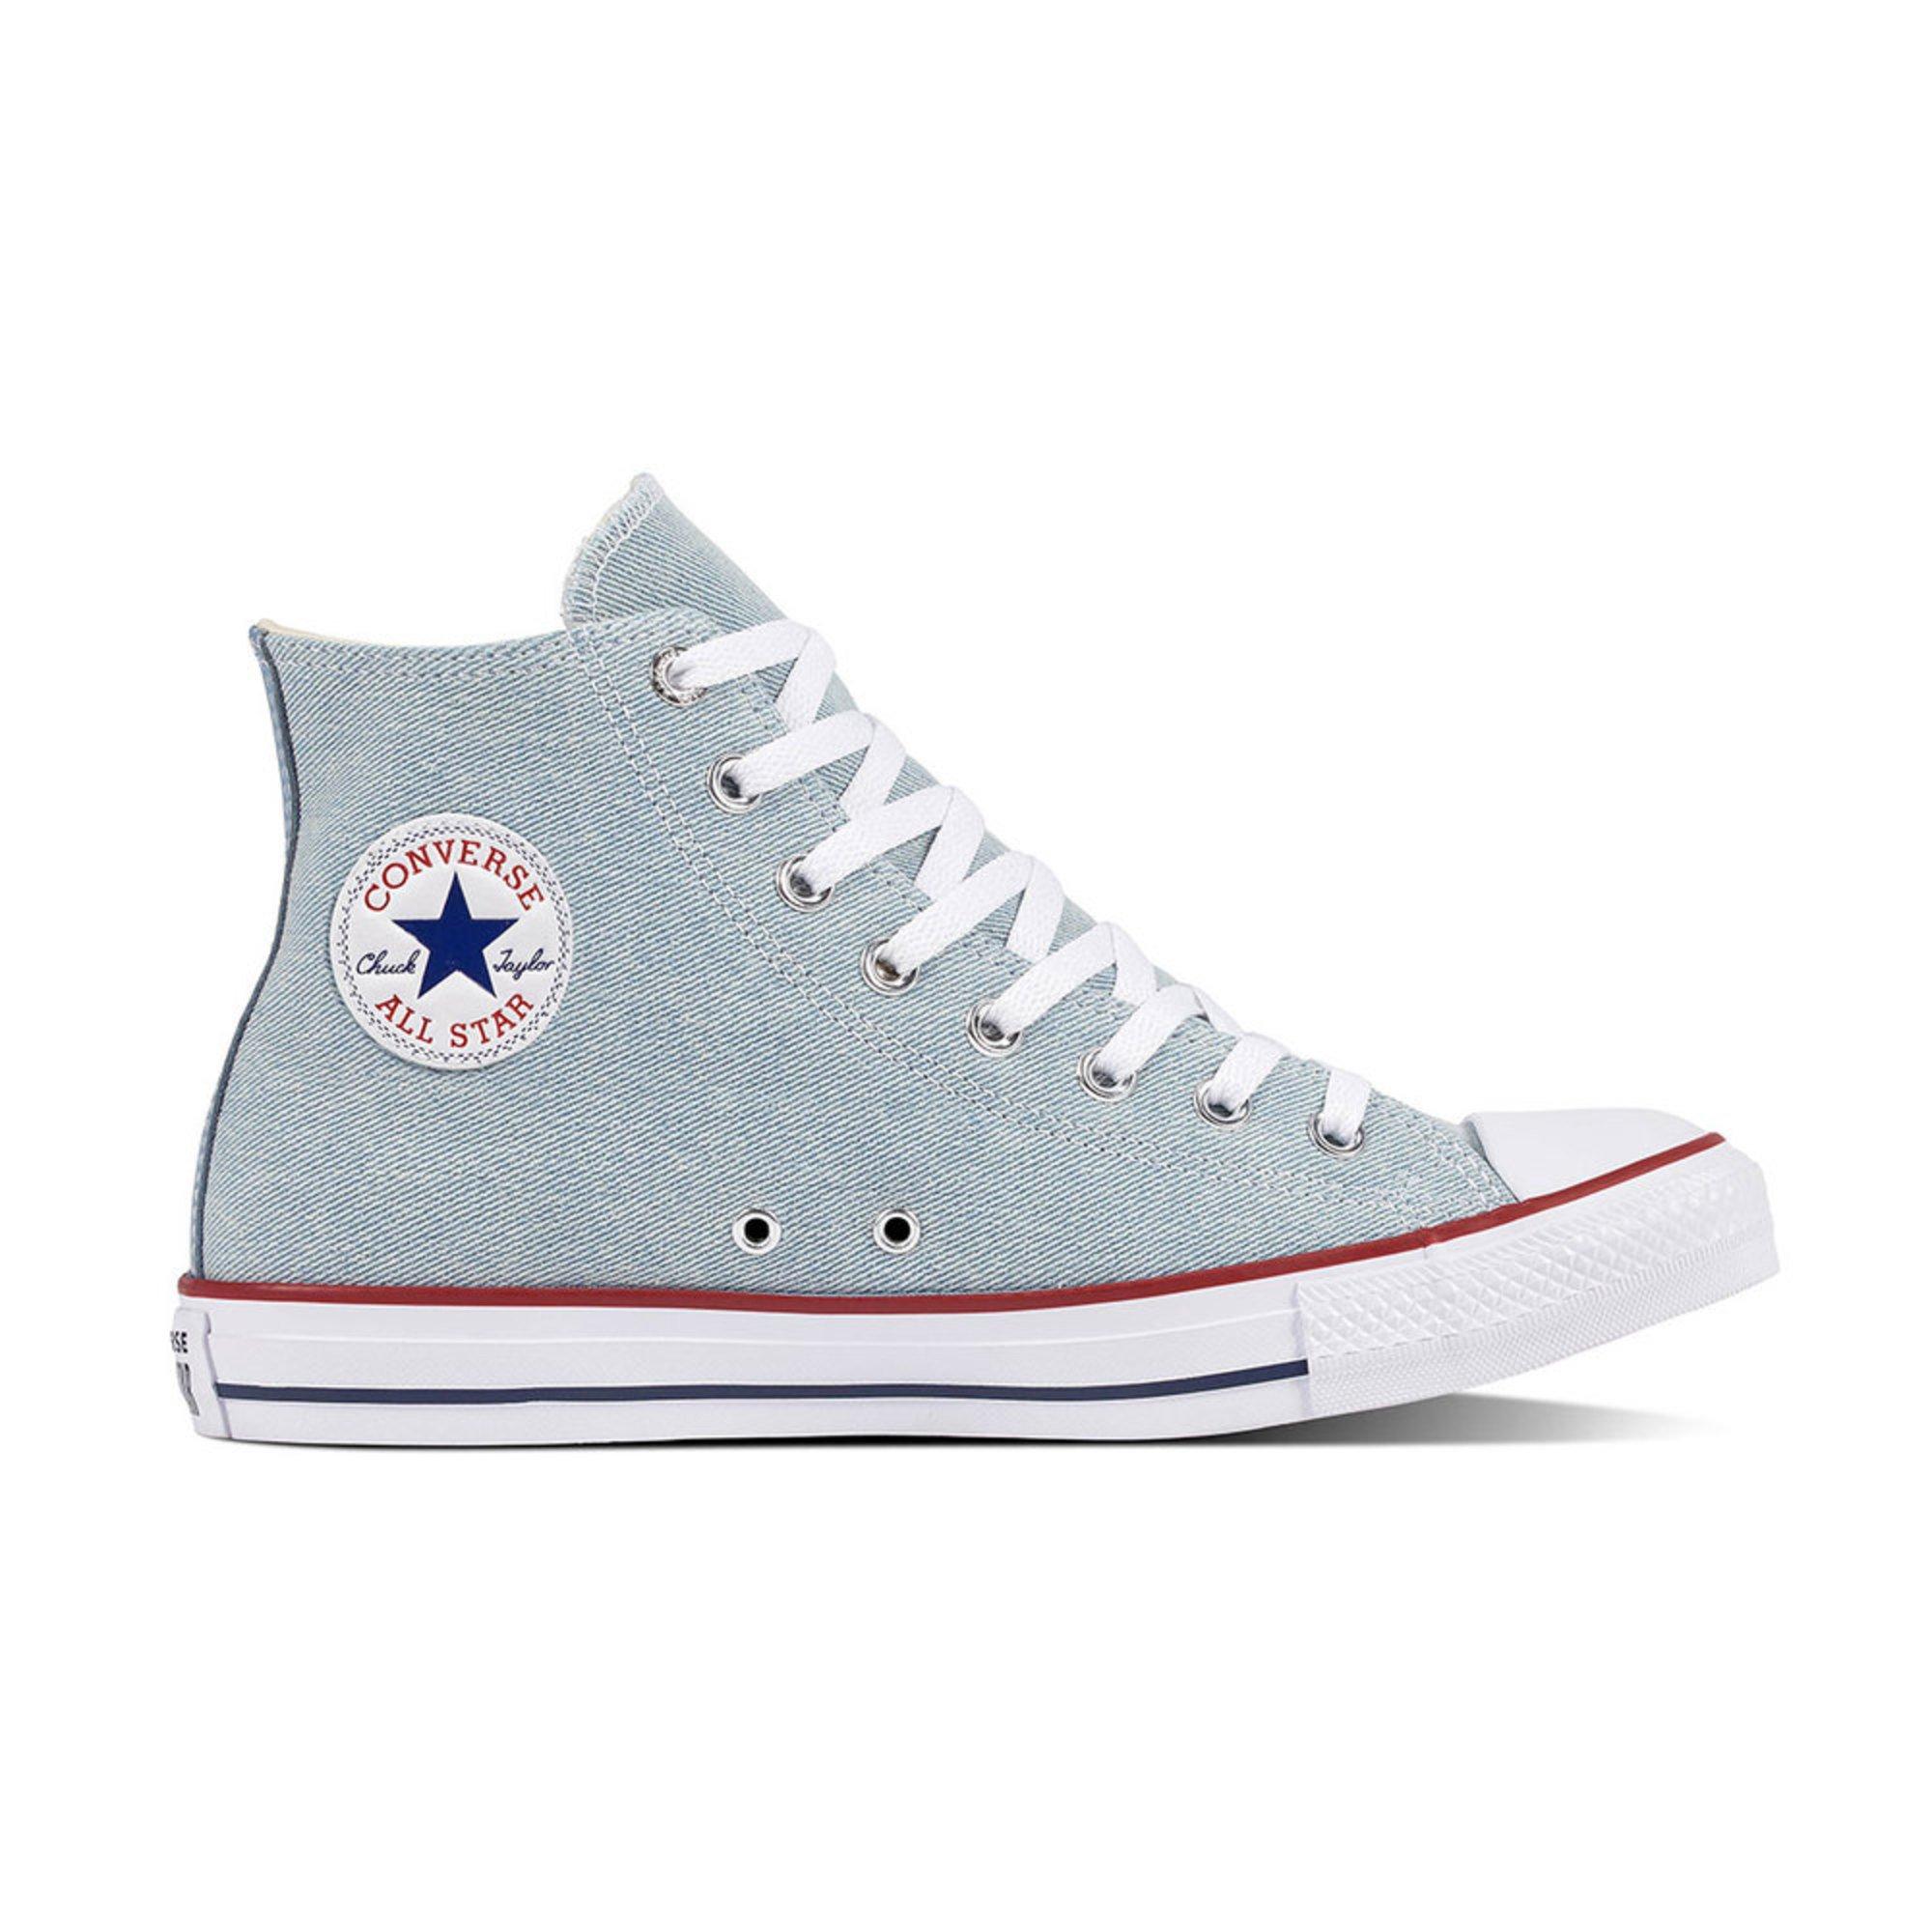 45e1e37b510c Converse Women s Chuck Taylor All Star Hi Top Sneaker